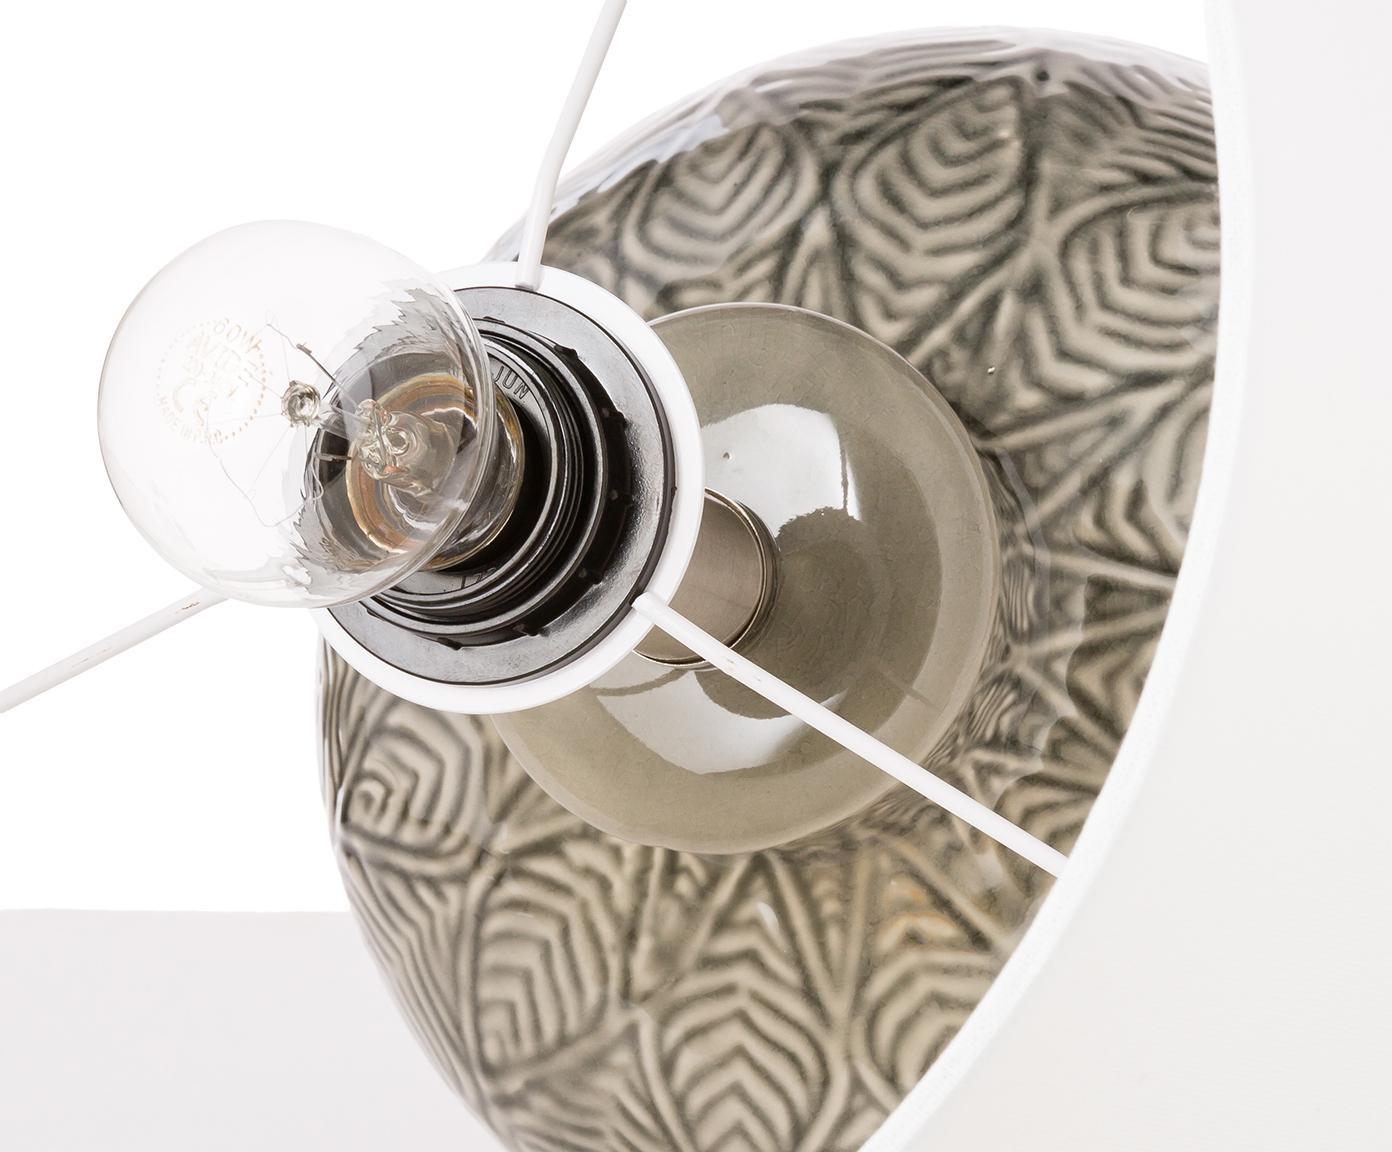 Tafellamp Brooklyn, Voetstuk: kristalglas, Lampvoet: keramiek, Lampenkap: textiel, Voetstuk: transparant. Lampvoet: grijs. Lampenkap: crèmekleurig. Snoer: transpar, Ø 33 x H 53 cm